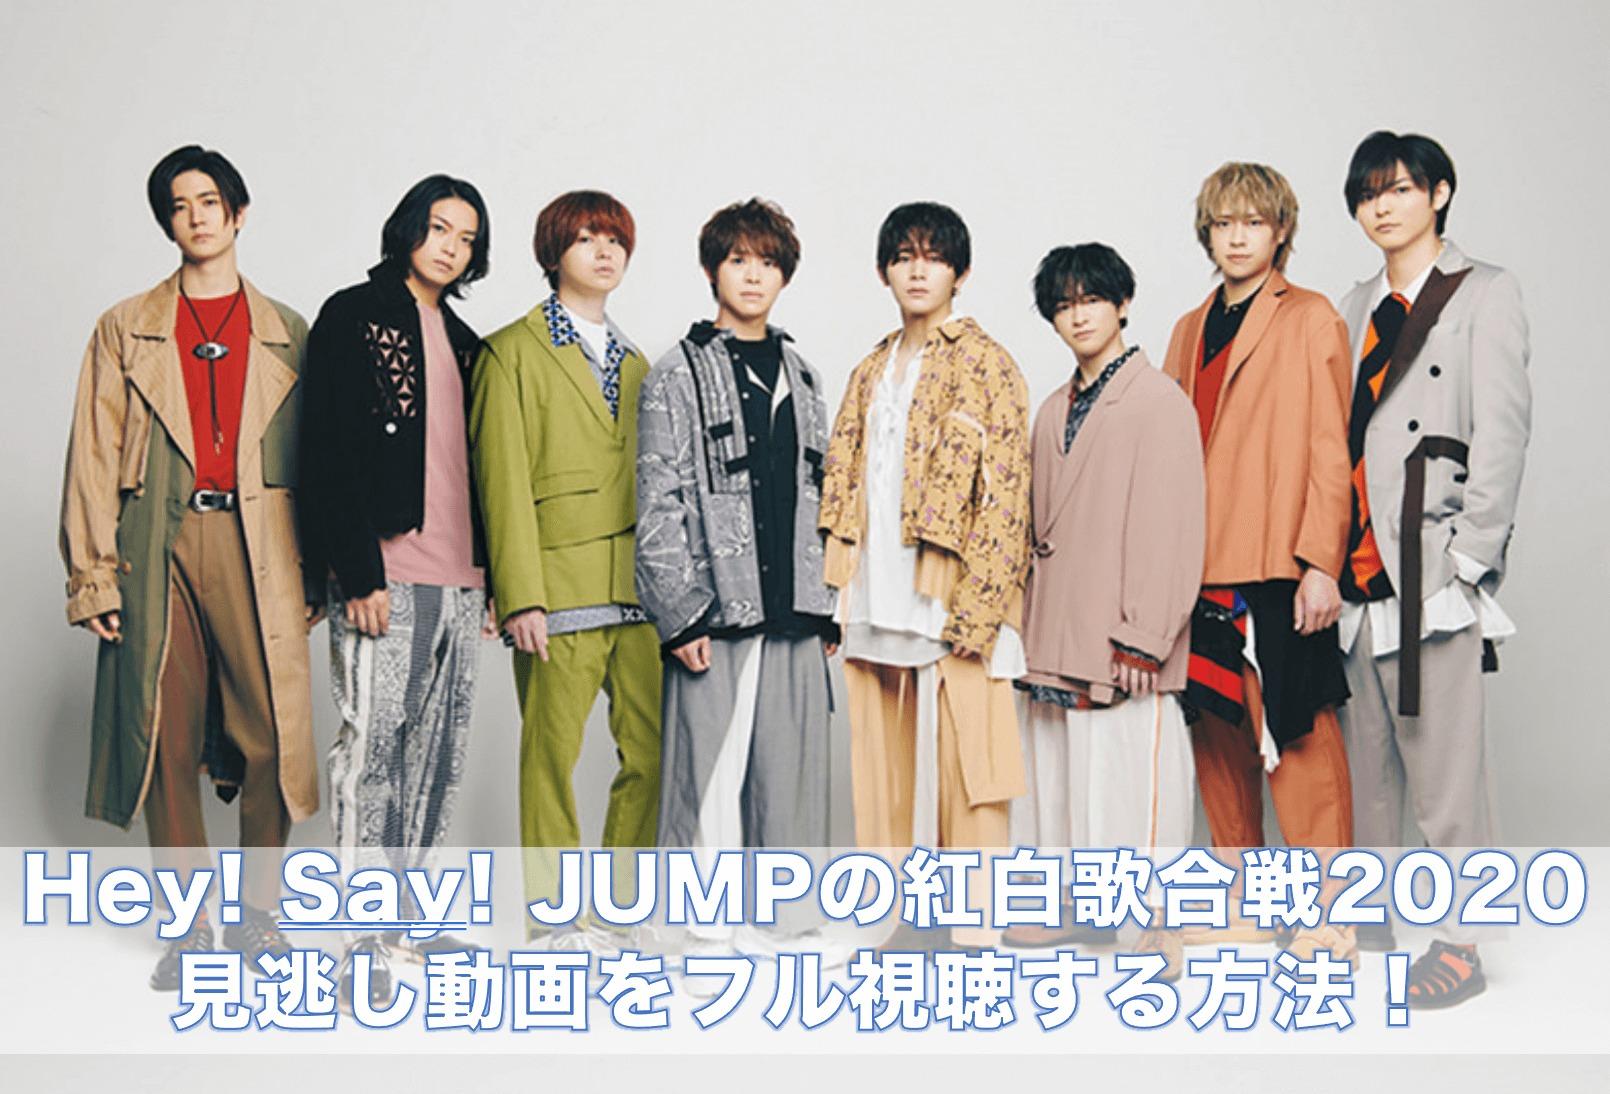 Hey! Say! JUMPの紅白歌合戦2020見逃し動画をフル視聴する方法!